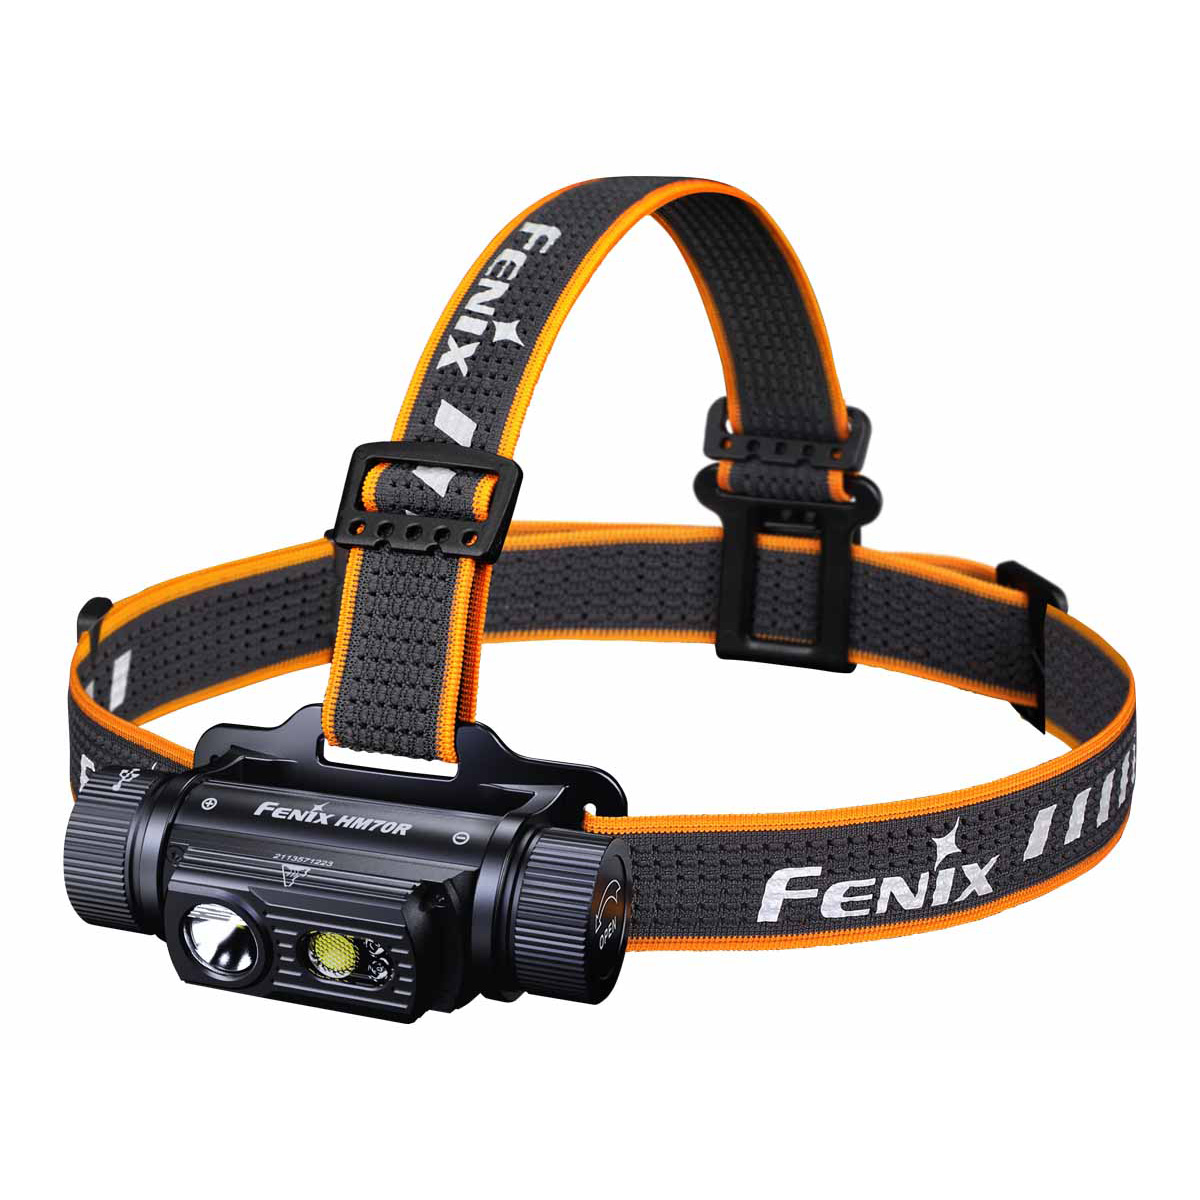 ĐÈN PIN FENIX - HM70R - 1600 LUMENS